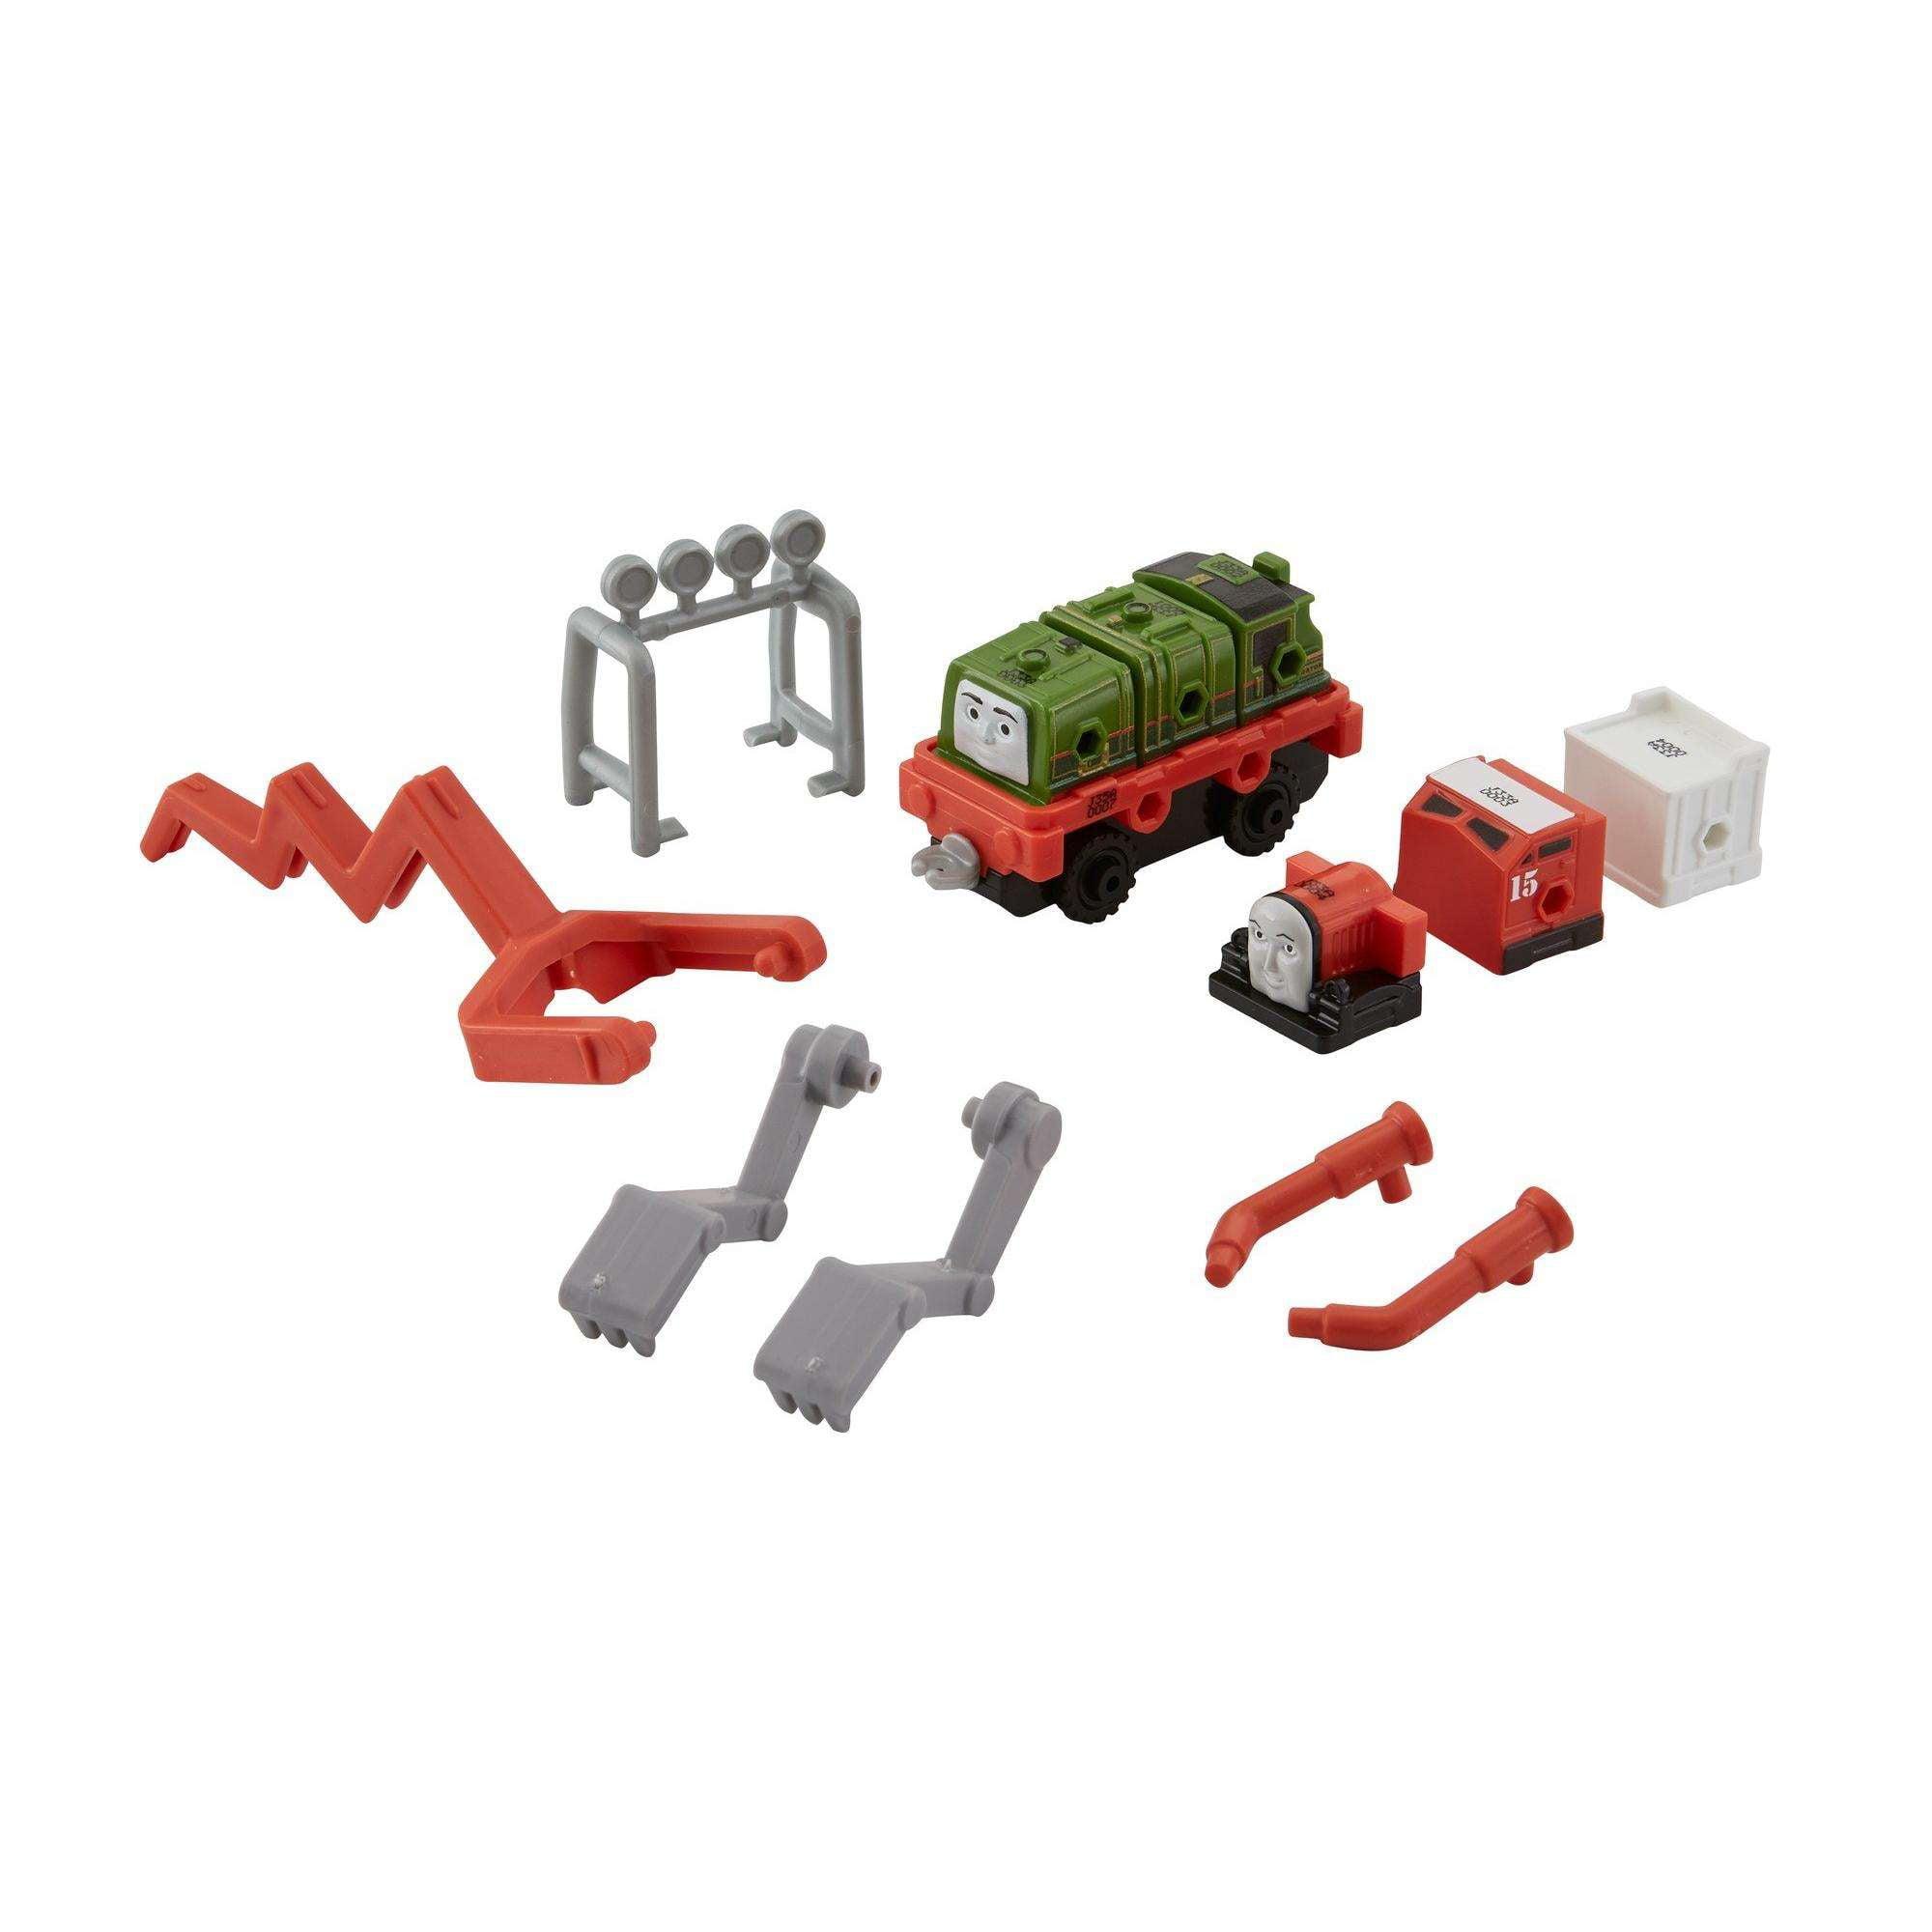 Thomas & Friends Adventures Train Maker Monster Pack by Mattel